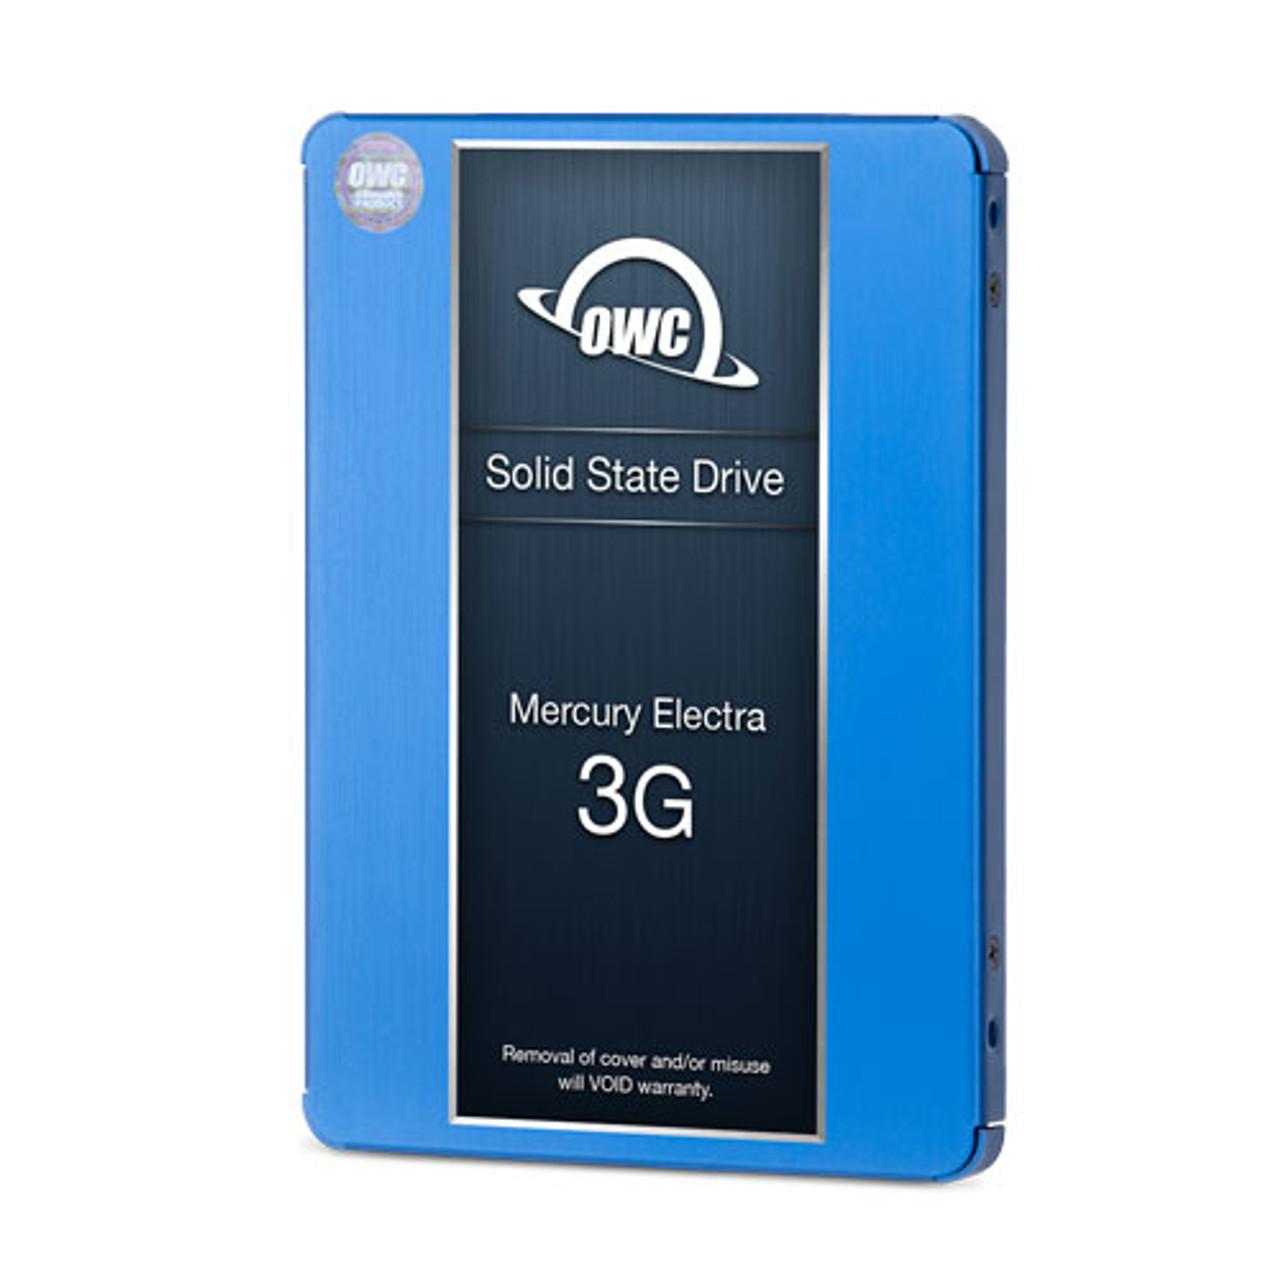 2TB Mercury Electra 3G SSD and Adapta-Drive 2.5-inch to 3.5-inch DIY bundle kit